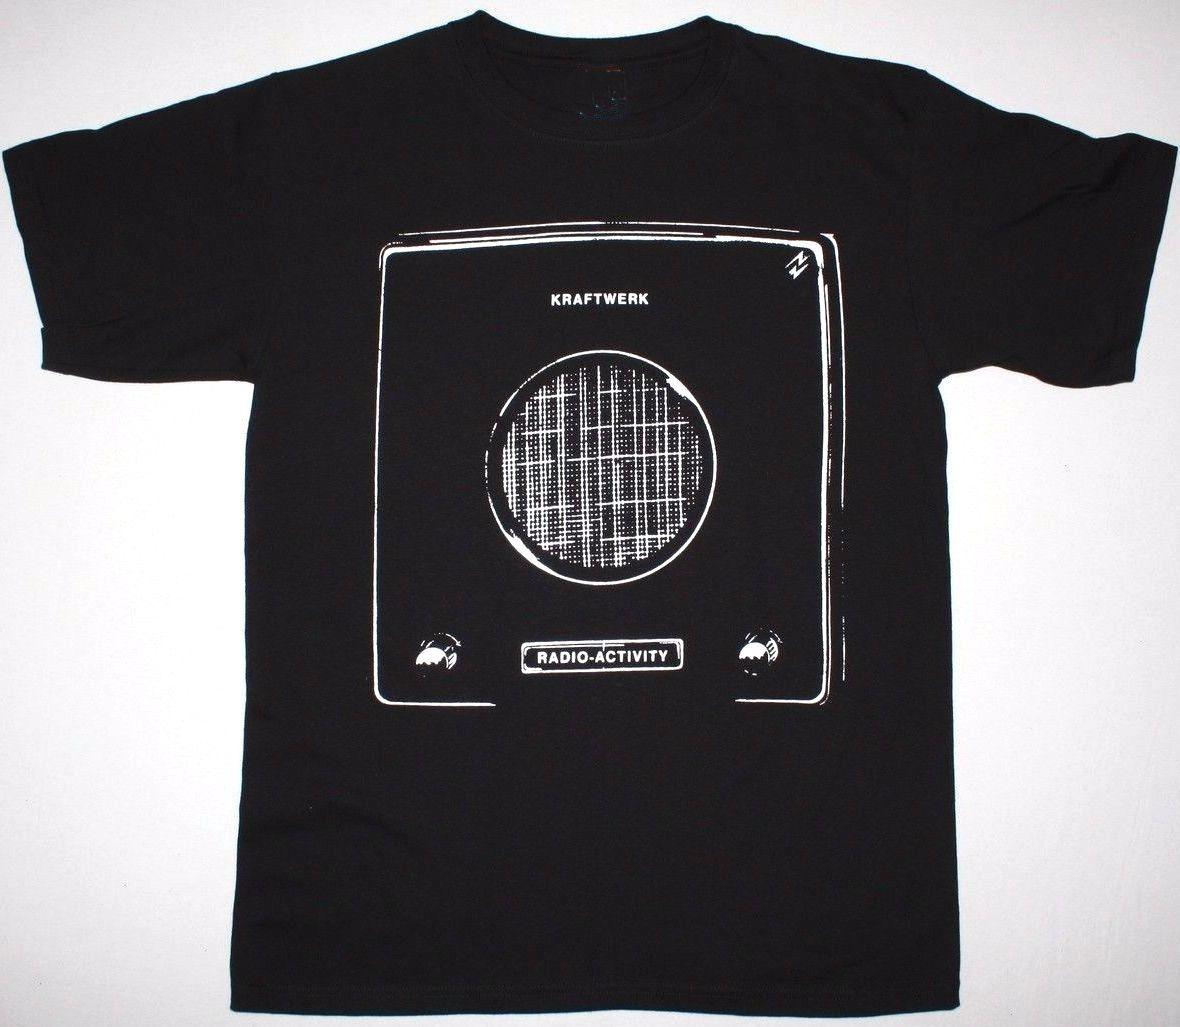 KRAFTWERK RADIO ACTIVITY MENS BLACK T-SHIRT ELECTRONIC SYNTH POP NEU! S-3XL 2018 Newest Letter Print Top Tee T Shirt